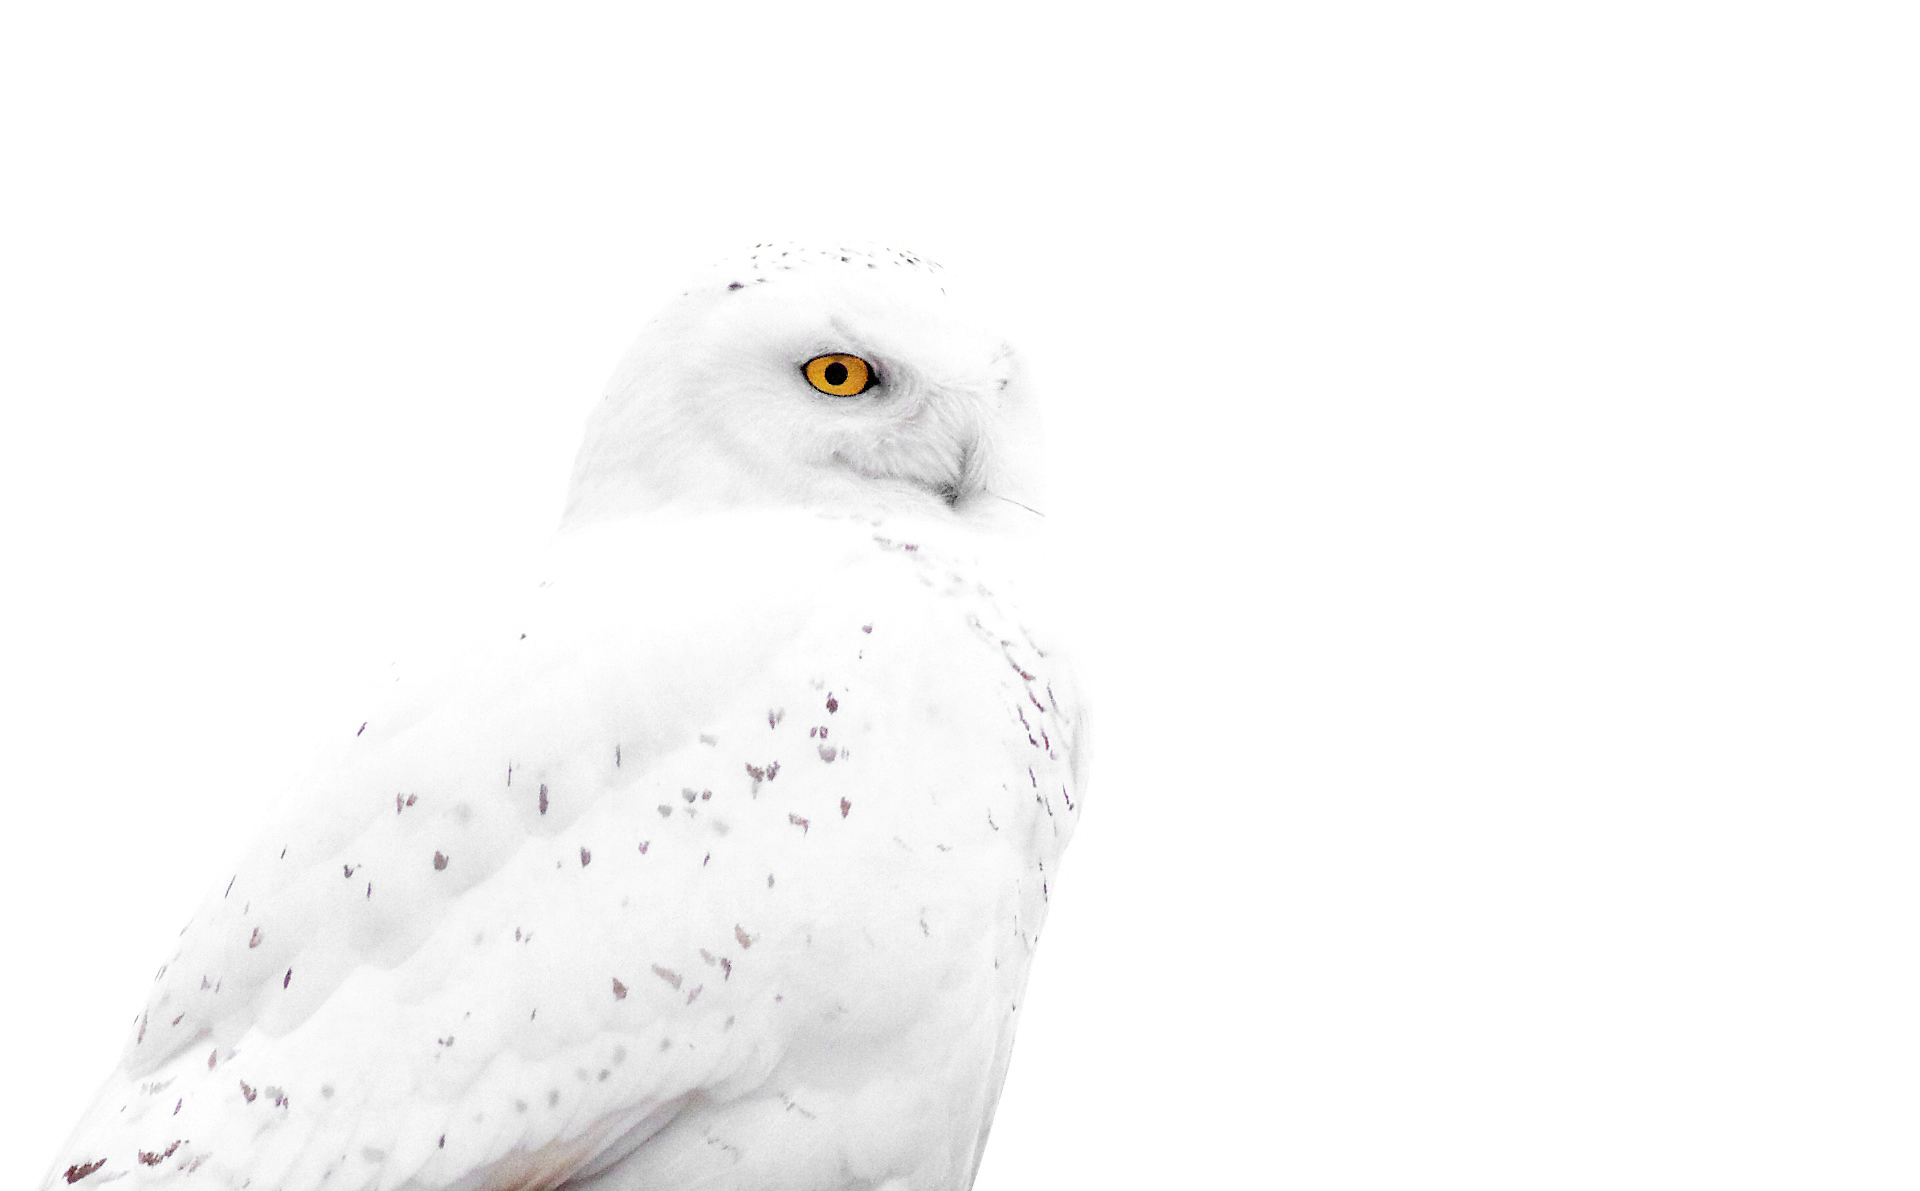 Canada Goose trillium parka sale 2016 - Barred Owl | The PhotoNaturalist